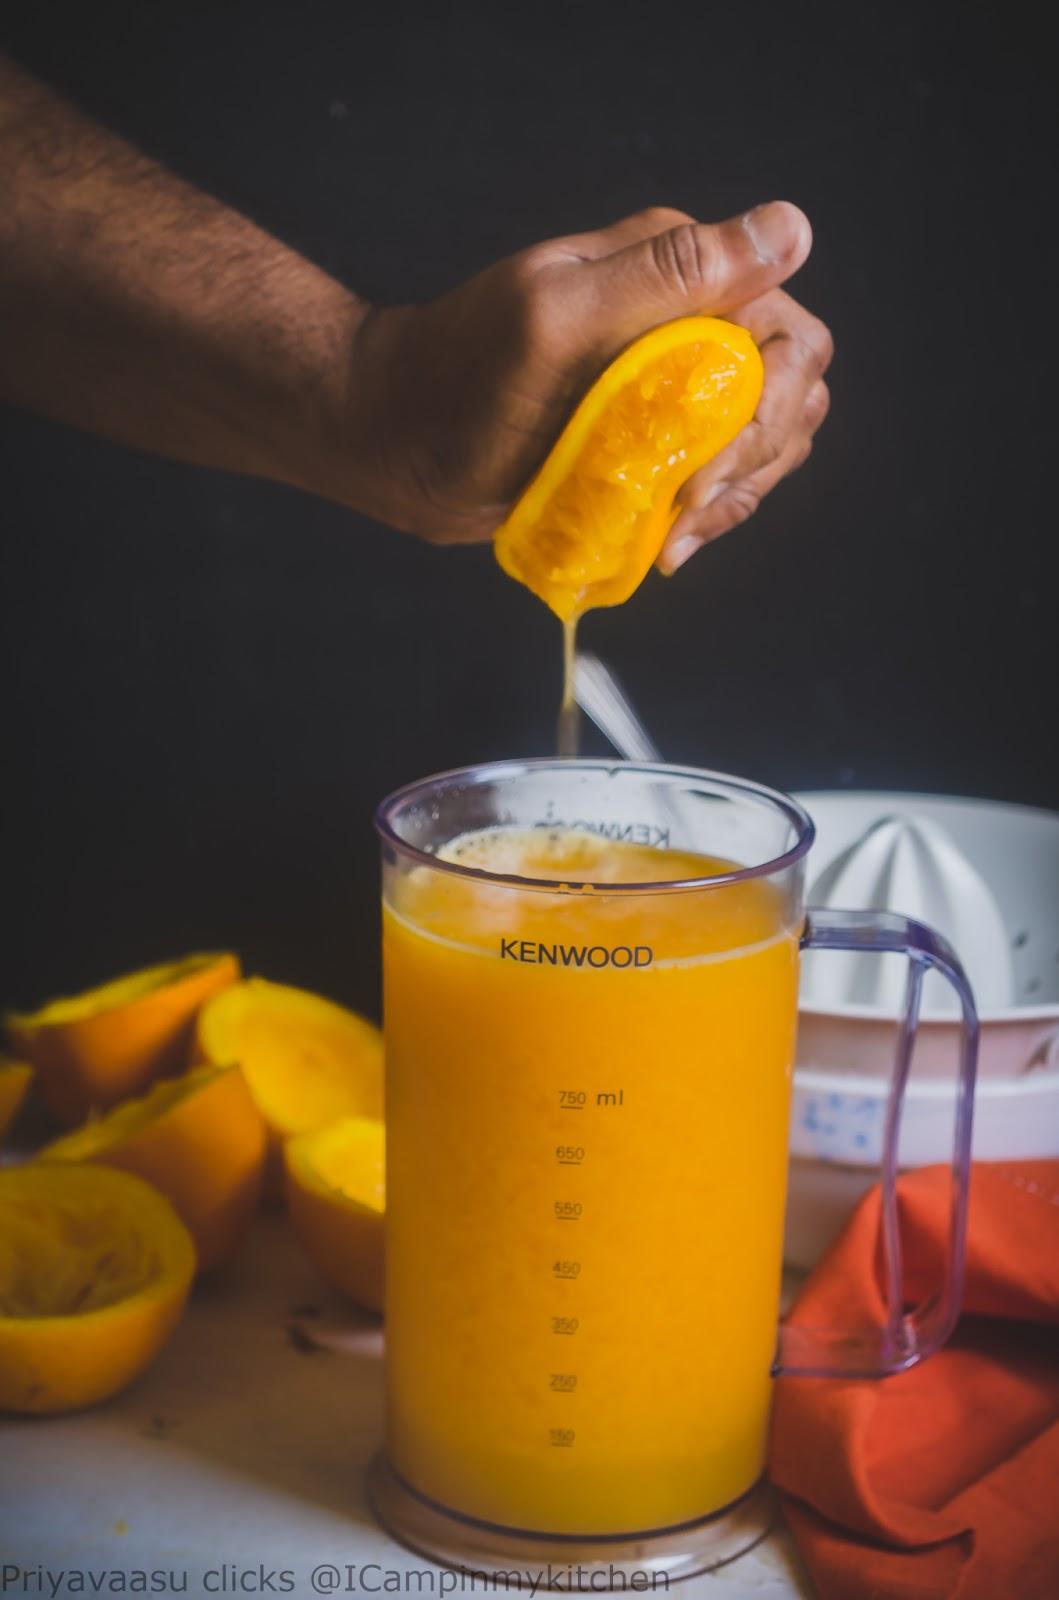 Orange Jelly/Orange Jelly using China grass/Agar-Agar - Vegan ~ I